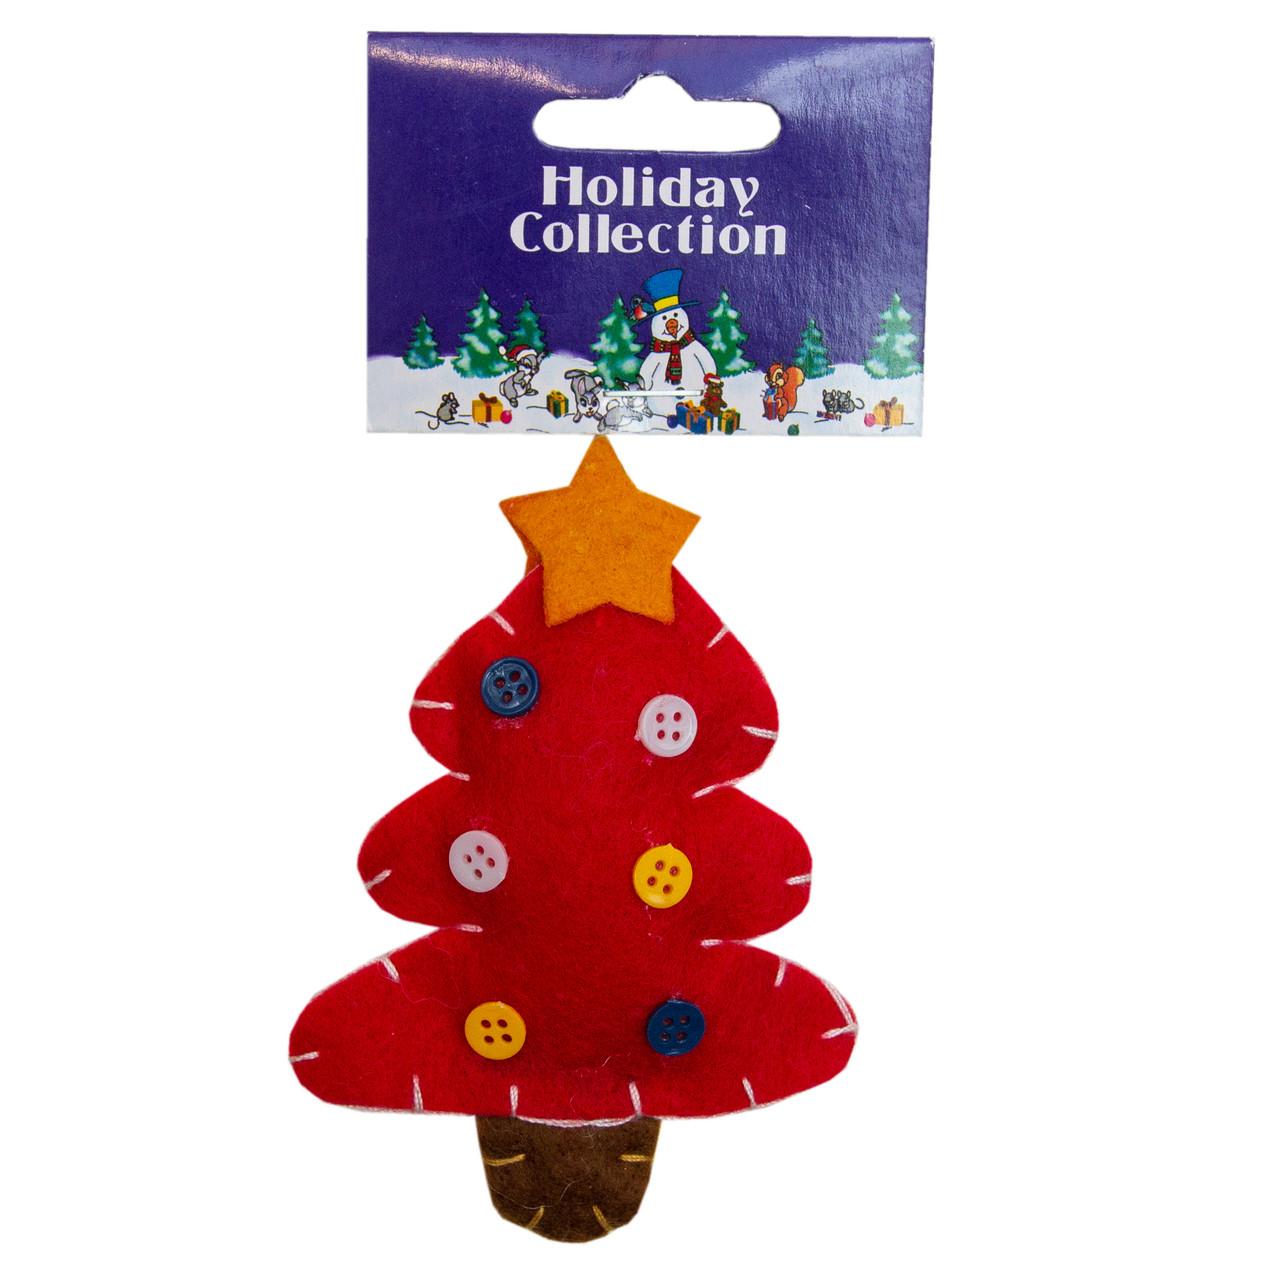 Елочная игрушка мягкая фигурка Красная елка, 11см (000401-8)